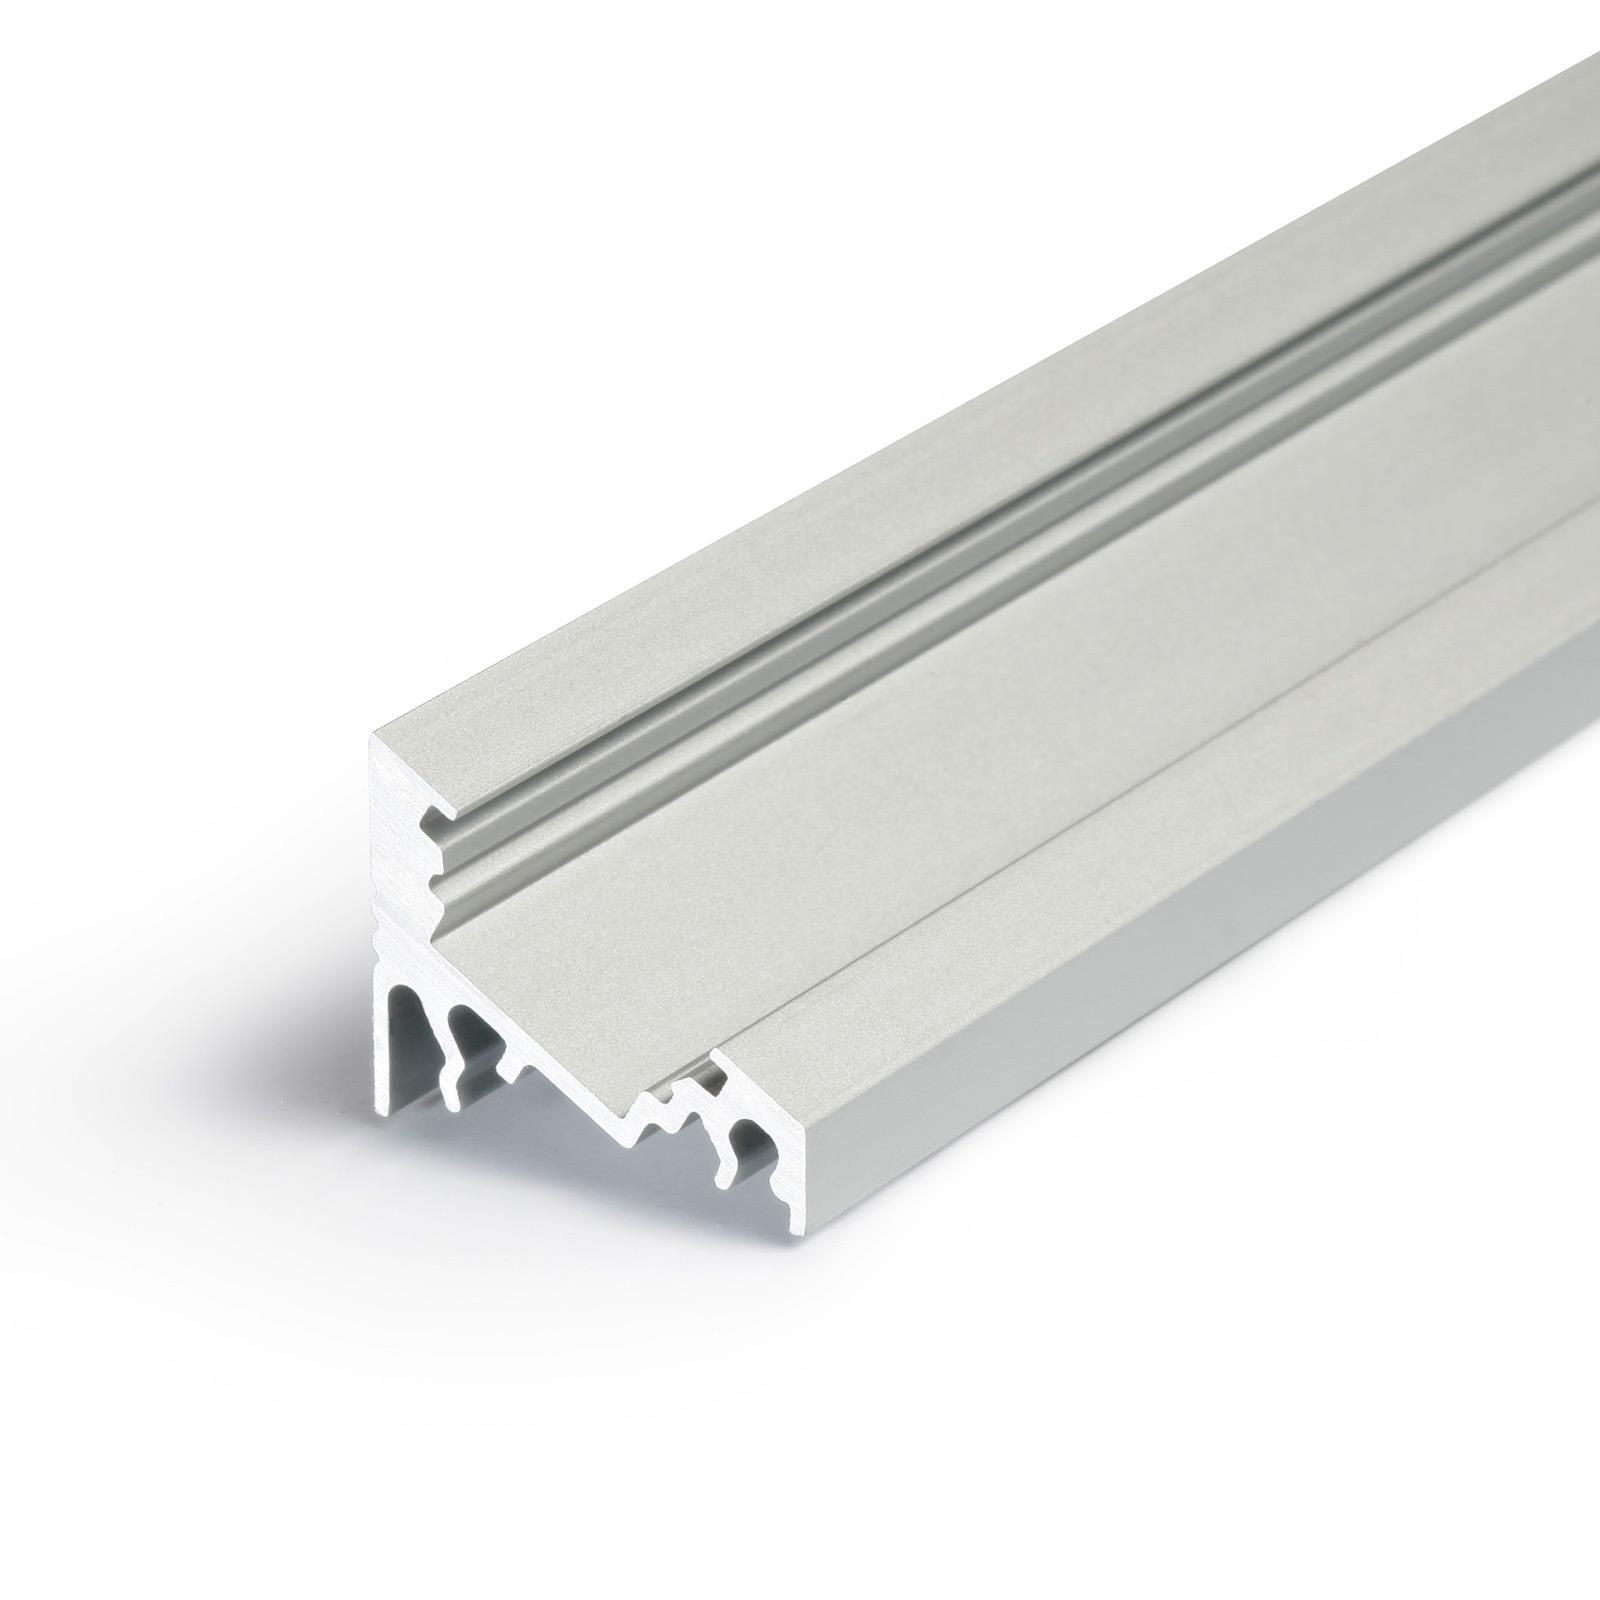 1-2 Meter LED Aufbau-Eckprofil CORNER (CO)